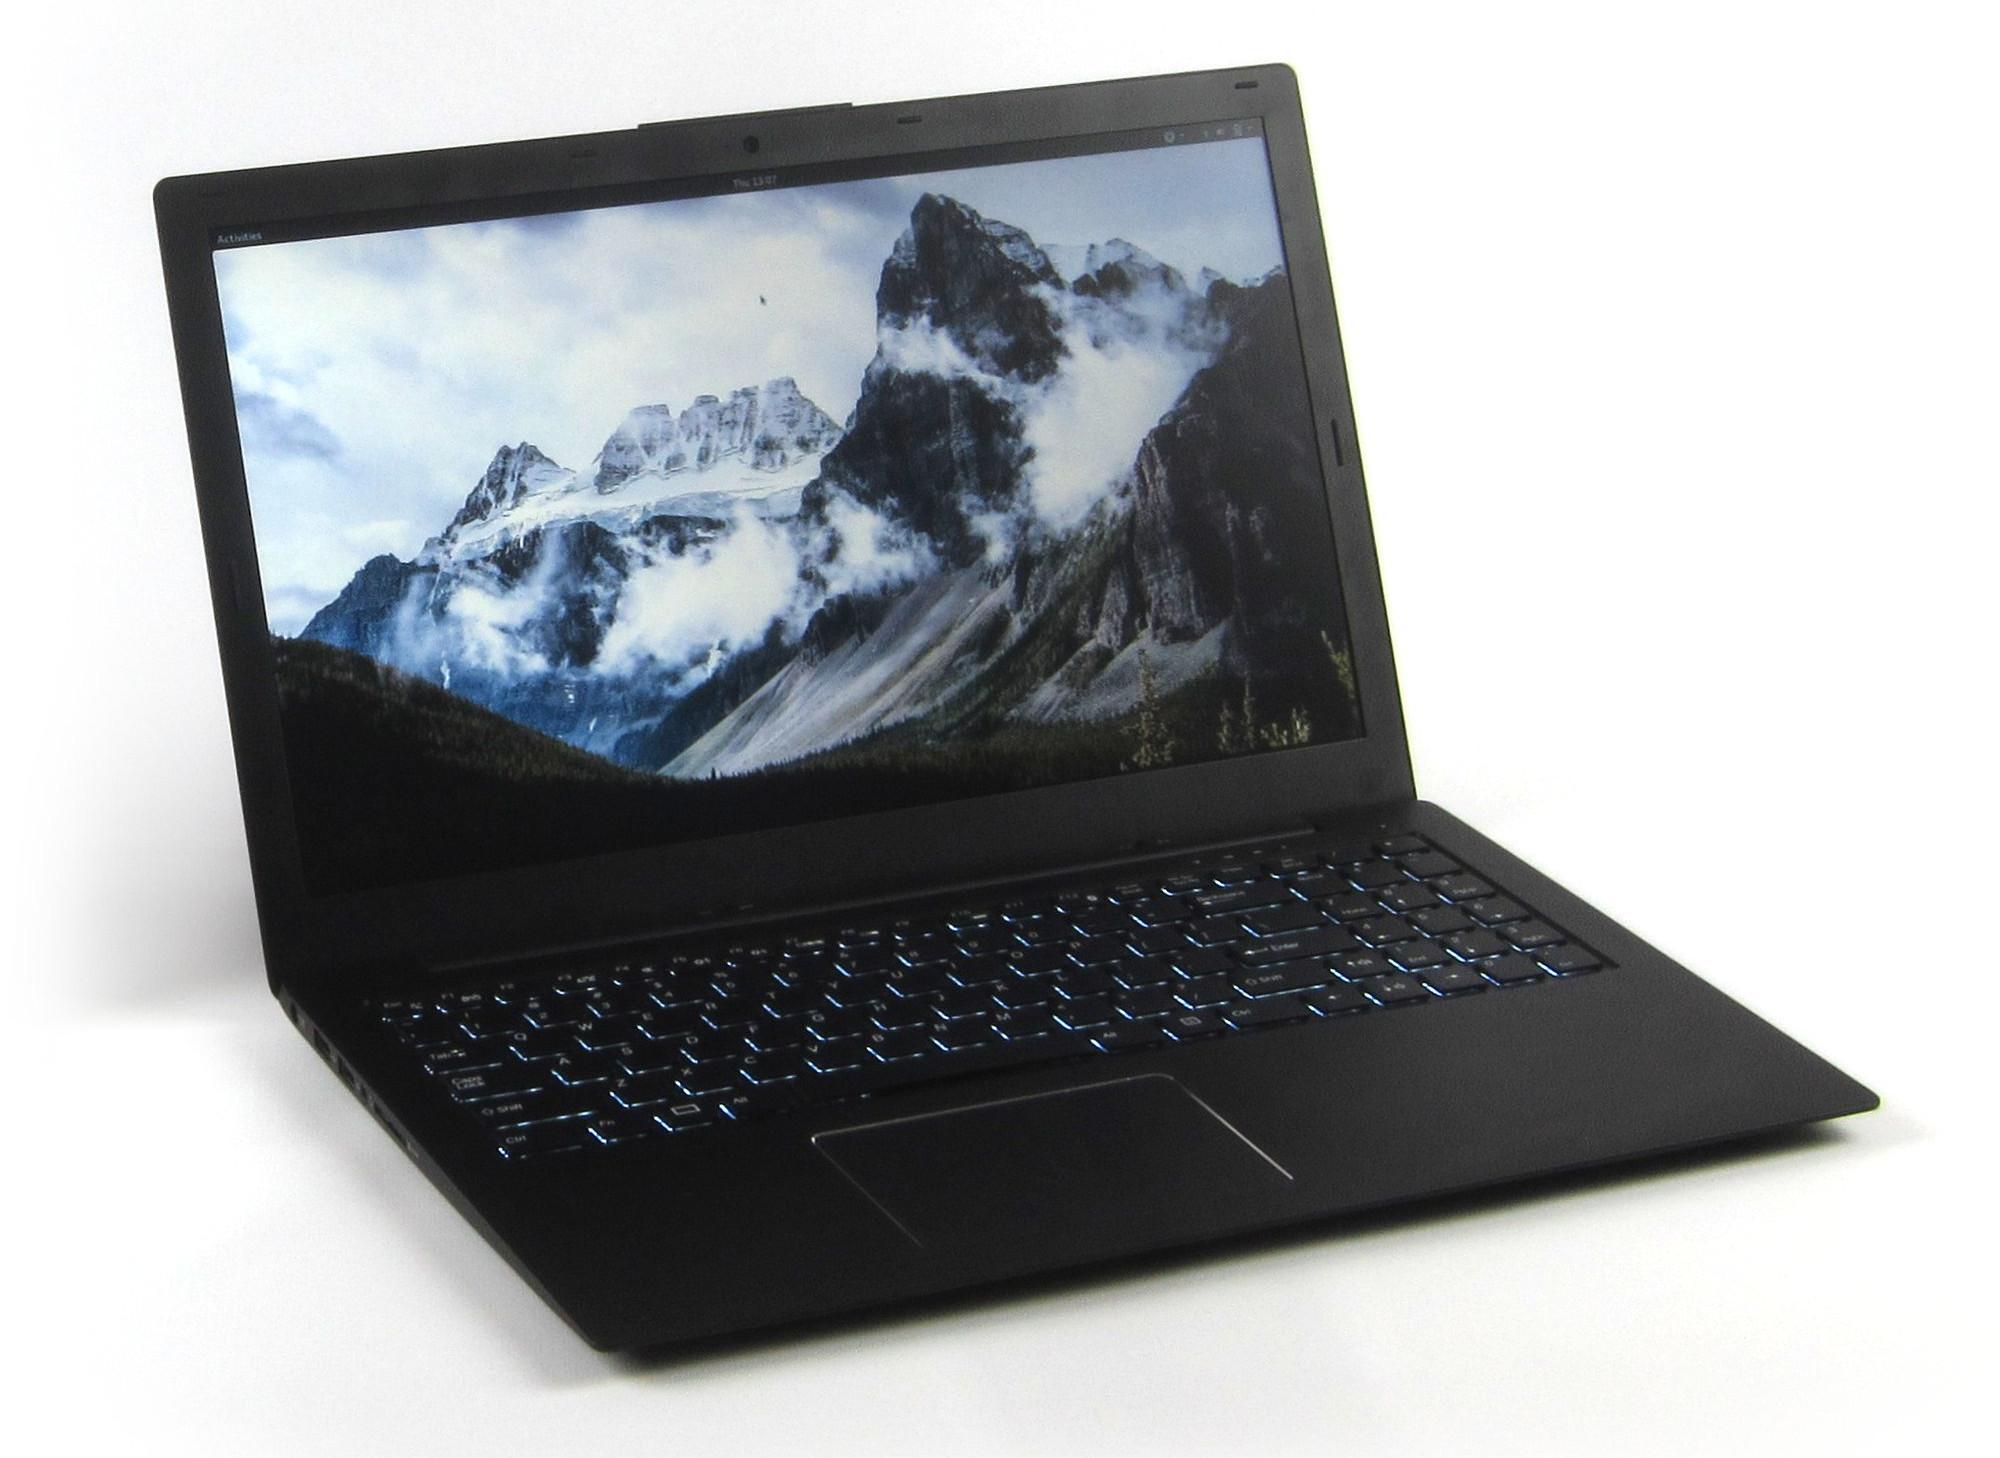 24 Best laptops for Linux as of 2019 - Slant